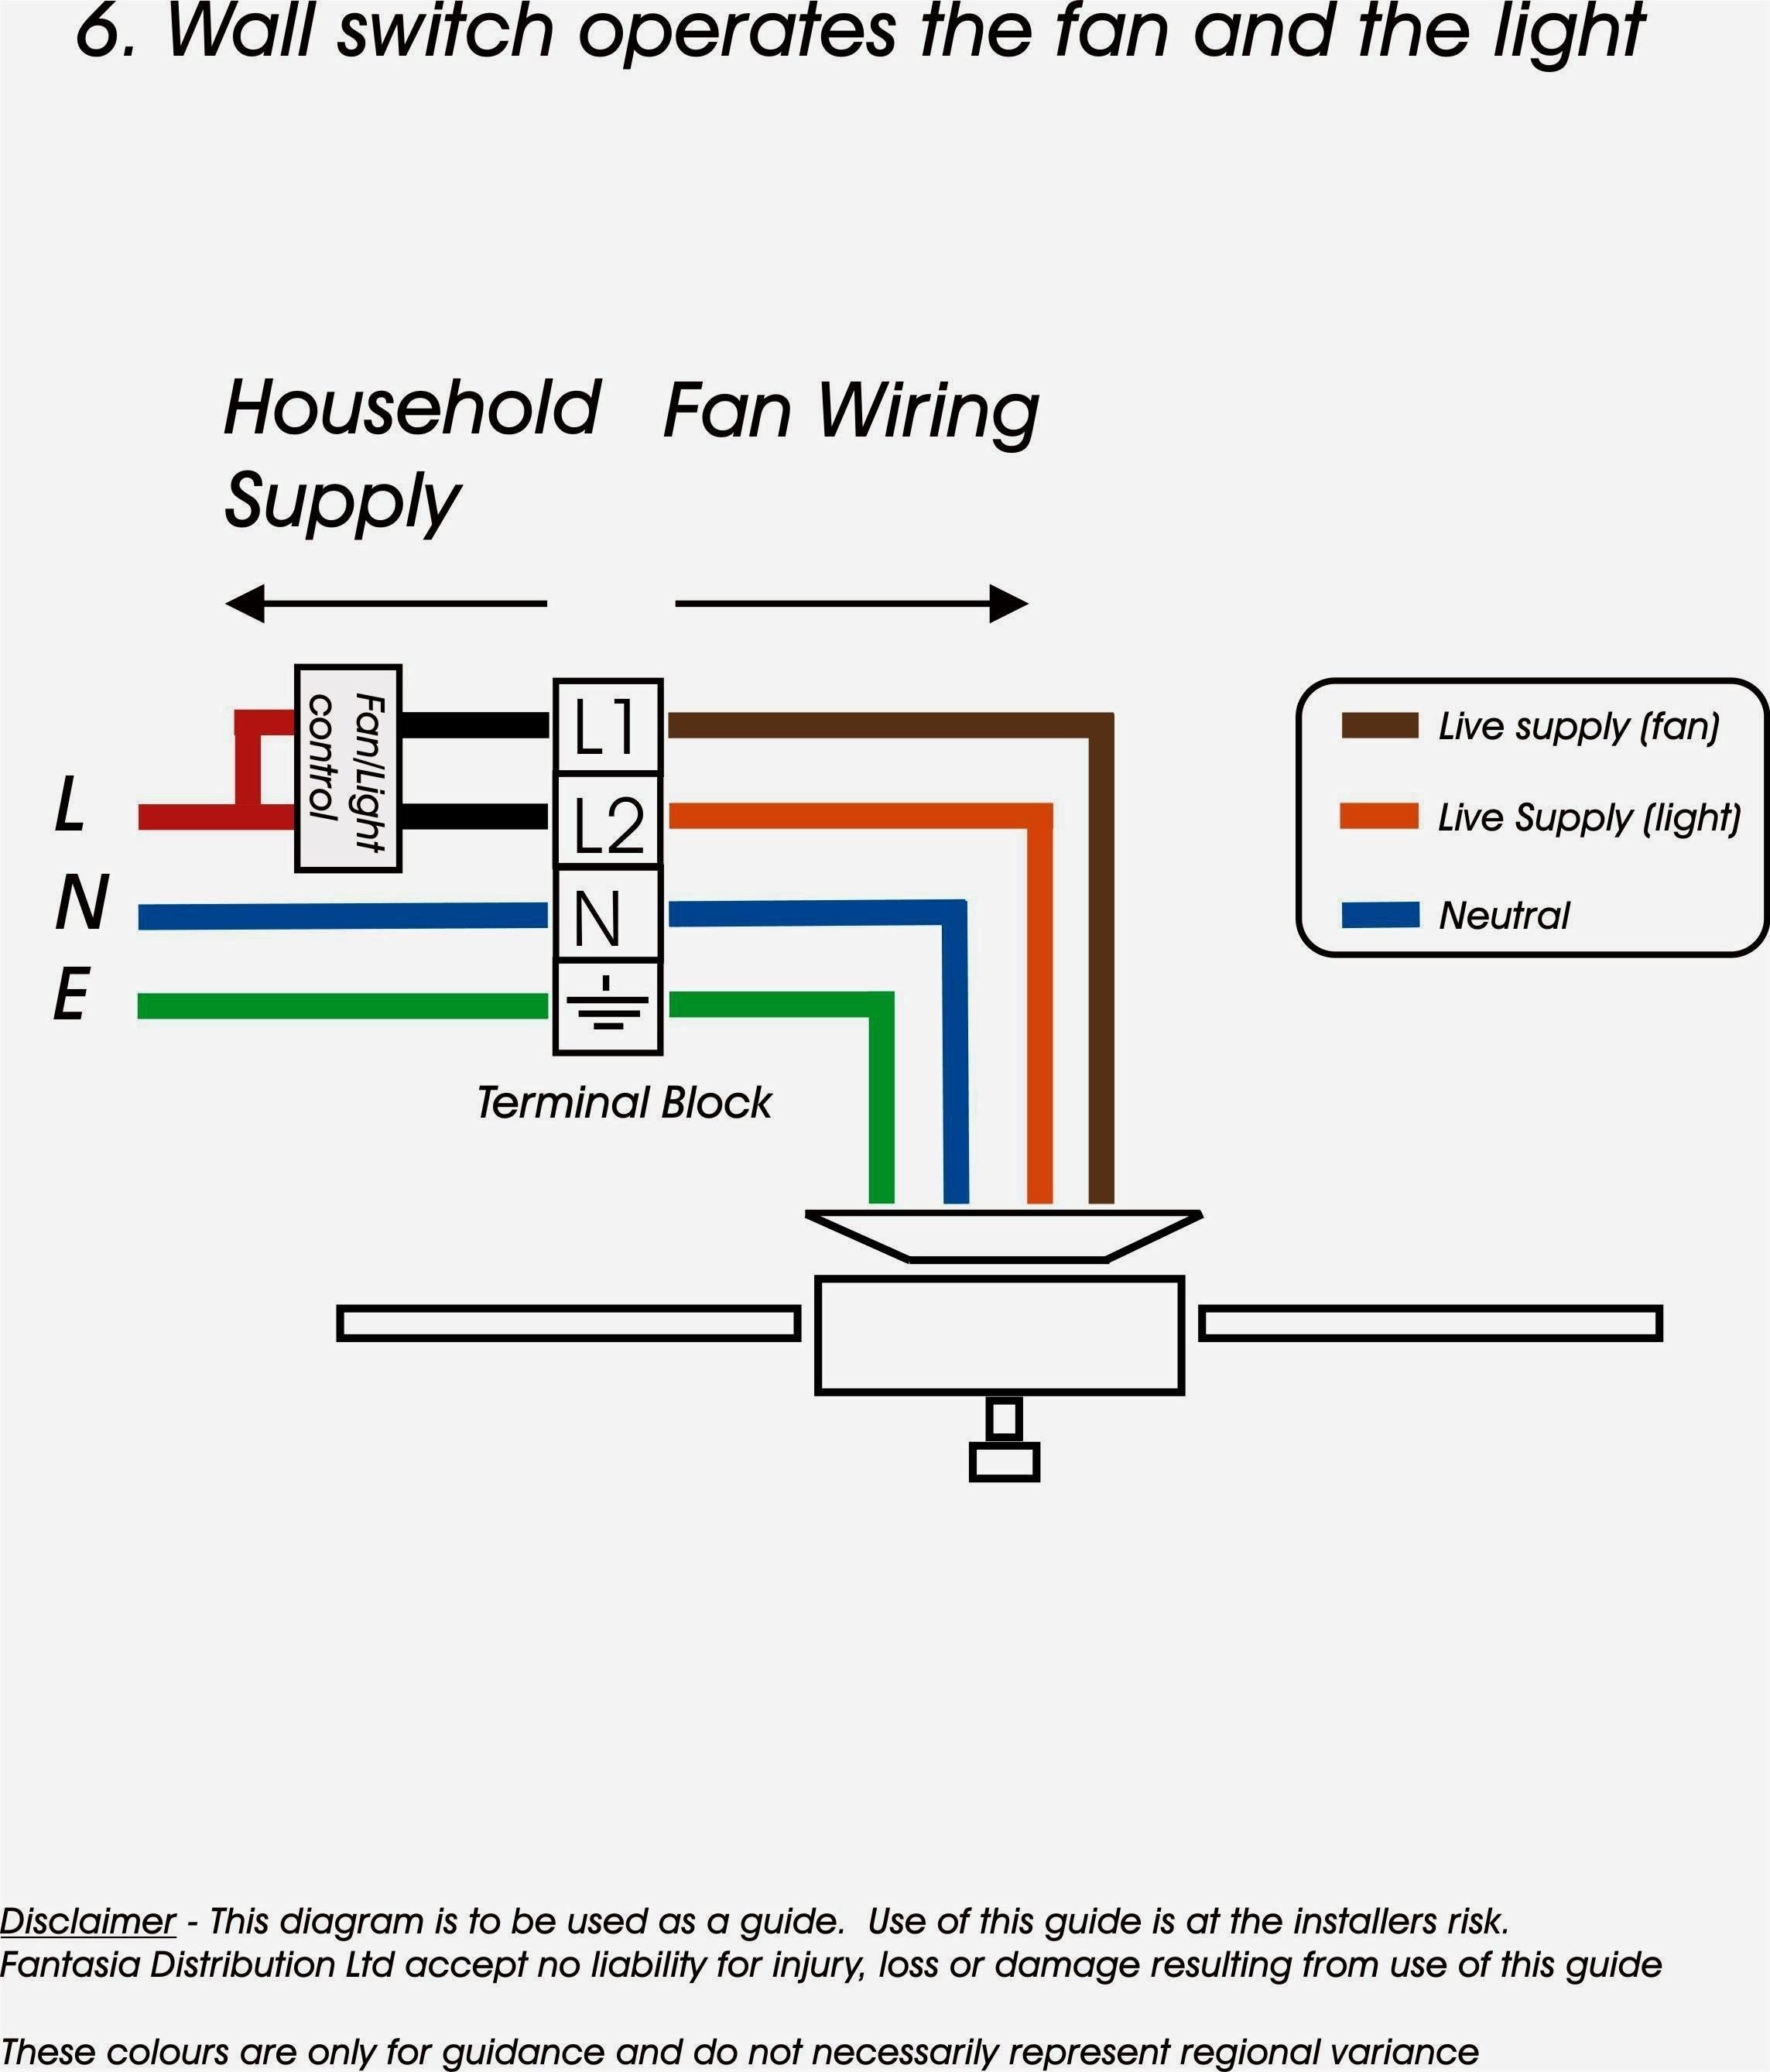 sylvania quicktronic ballast wiring diagram Download-Wiring Diagram Pics Detail Name sylvania quicktronic ballast wiring diagram – Sylvania Quicktronic Ballast Wiring Diagram Unique 12-i